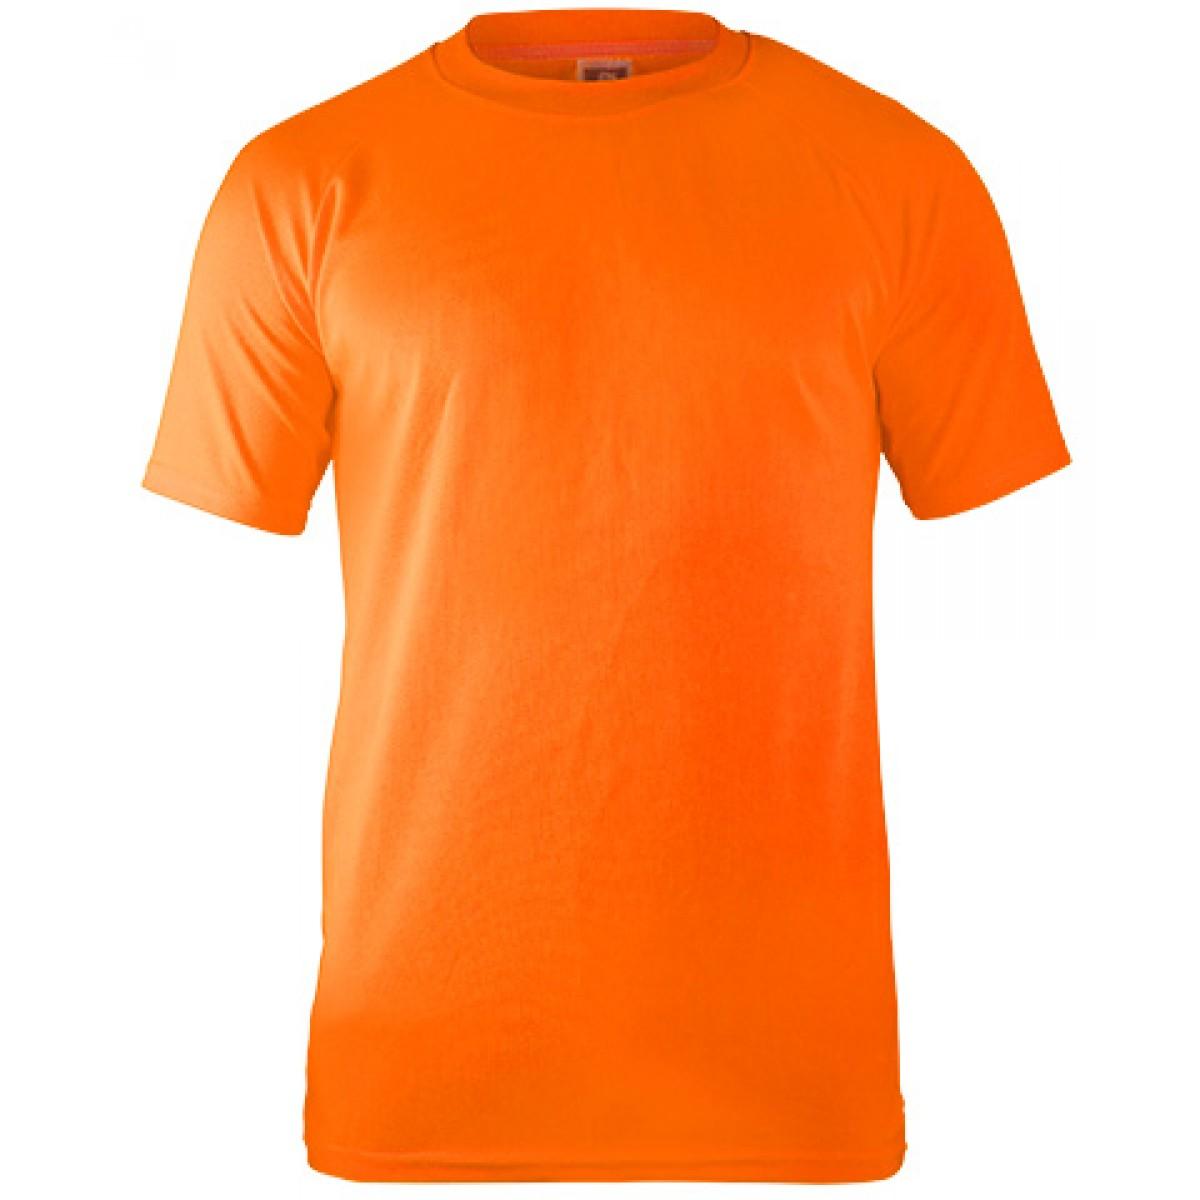 Performance T-shirt-Safety Orange-S